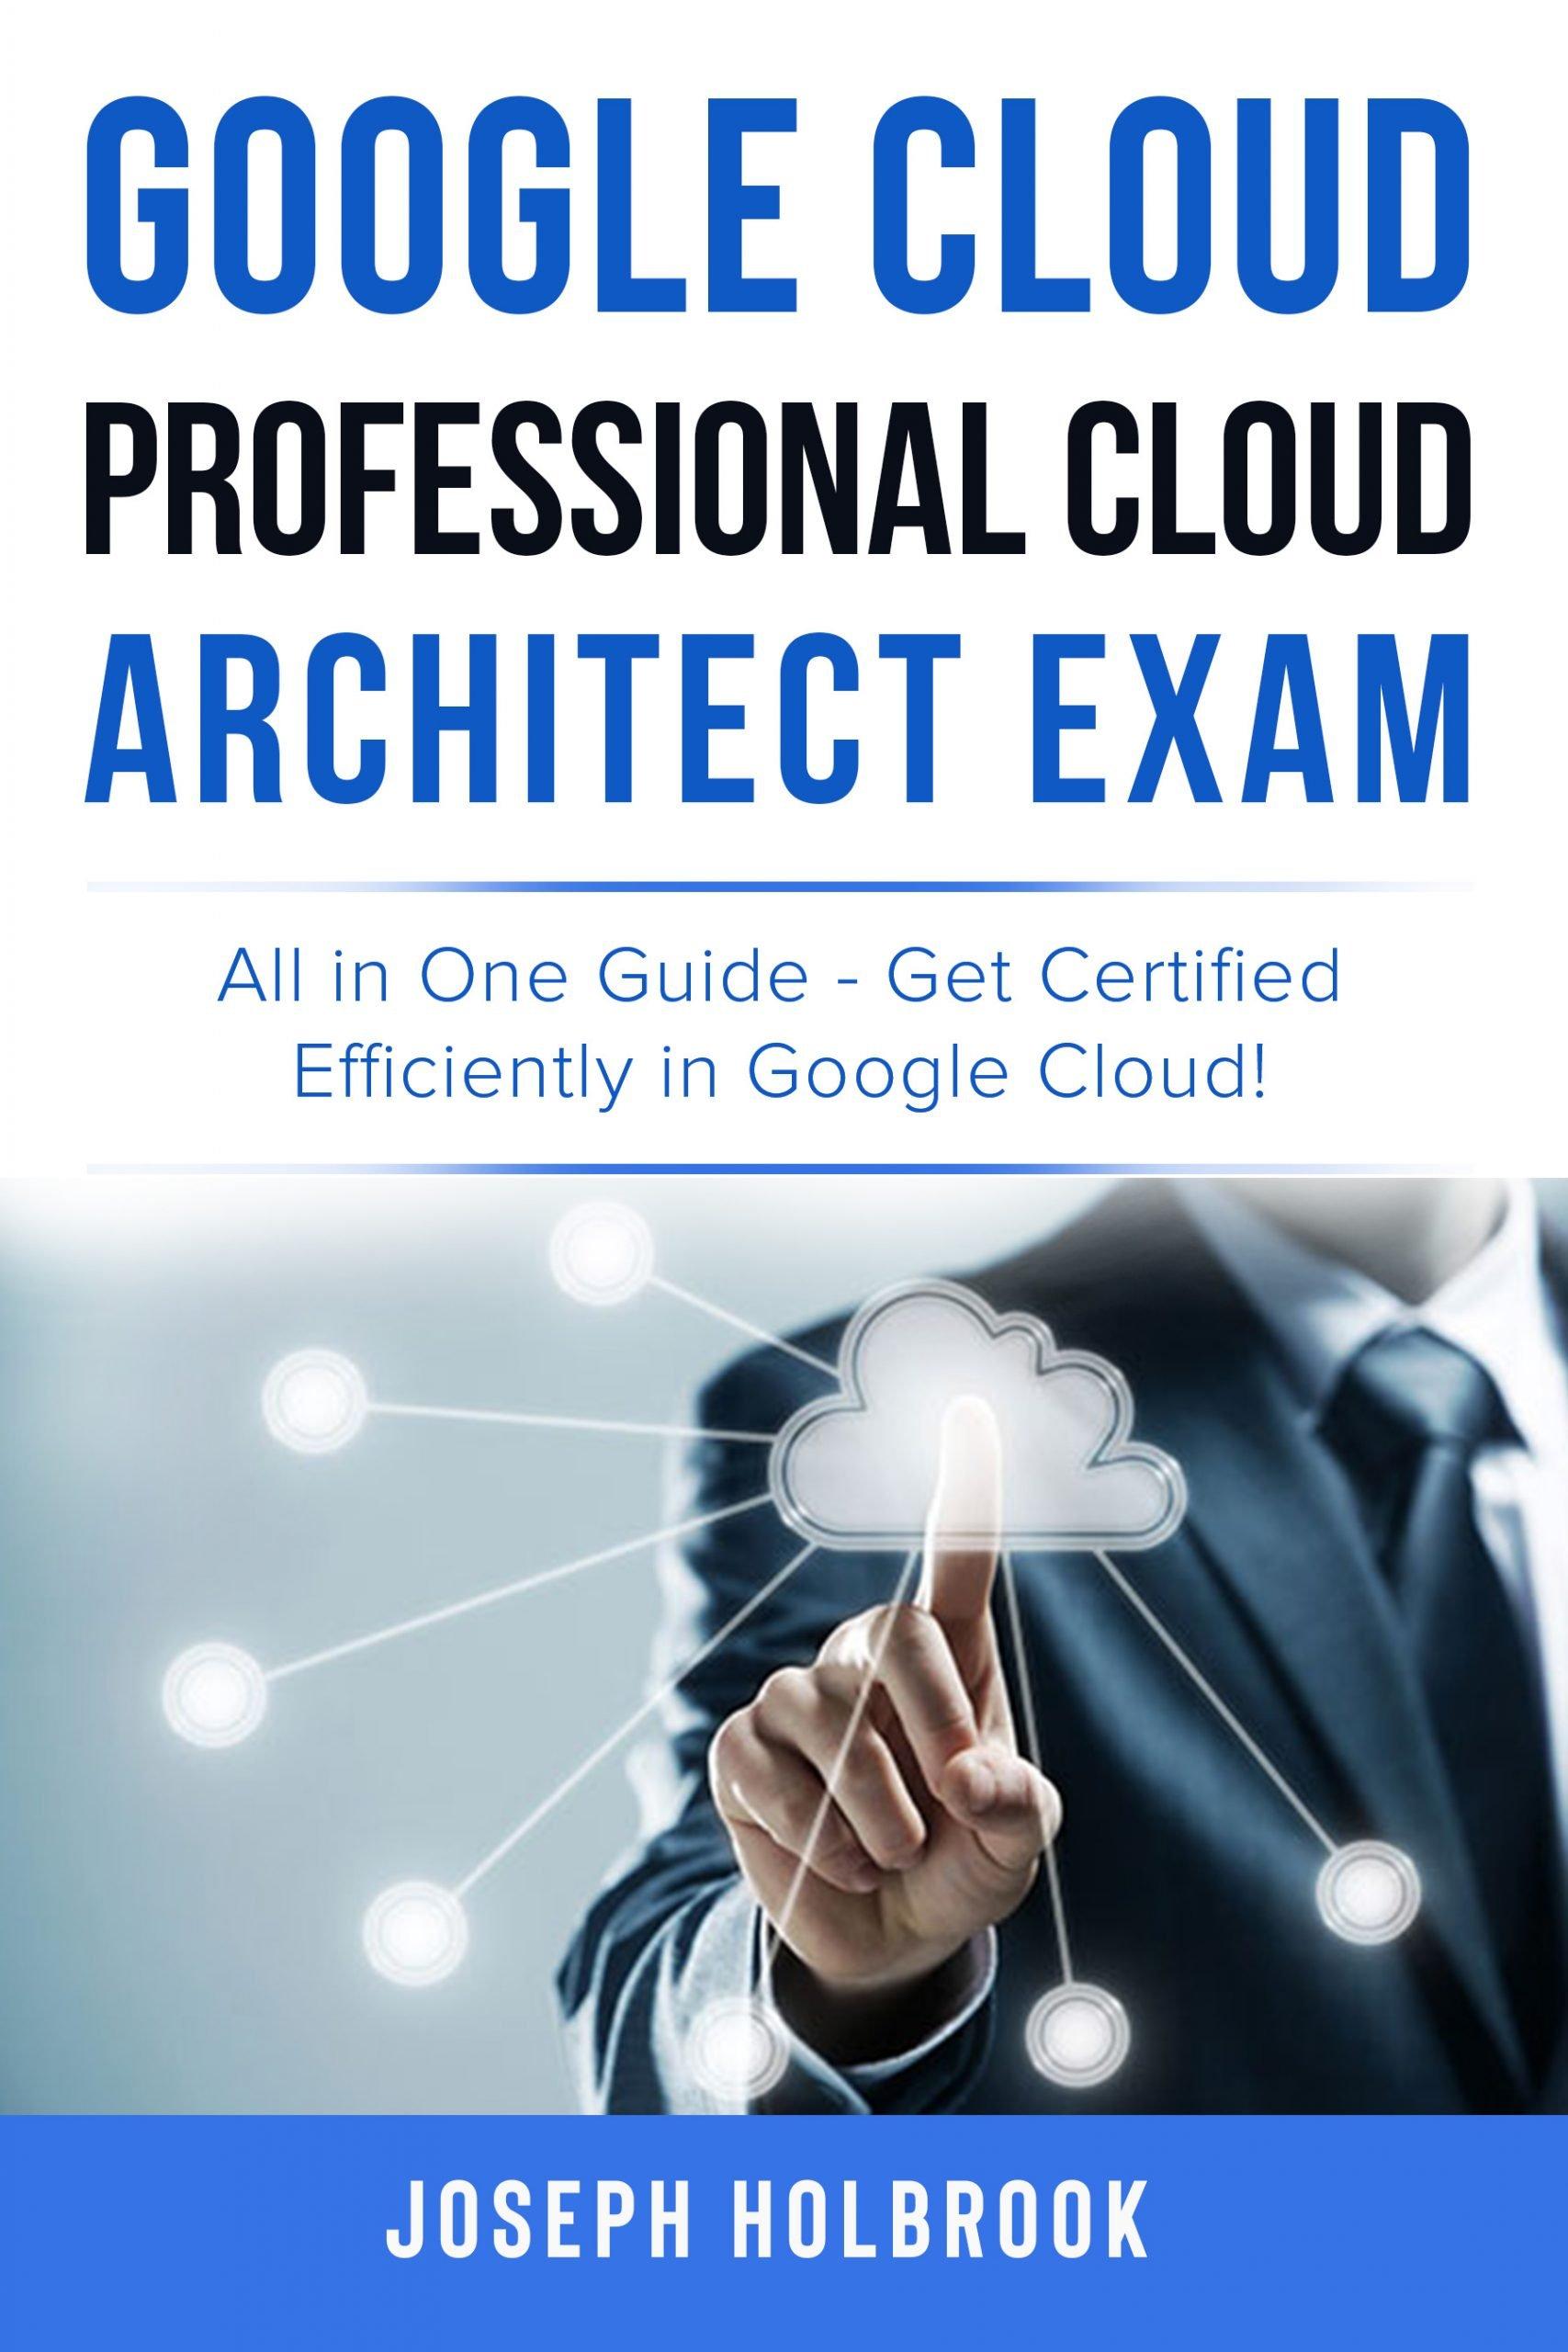 Google Cloud Professional Cloud Architect certification exam